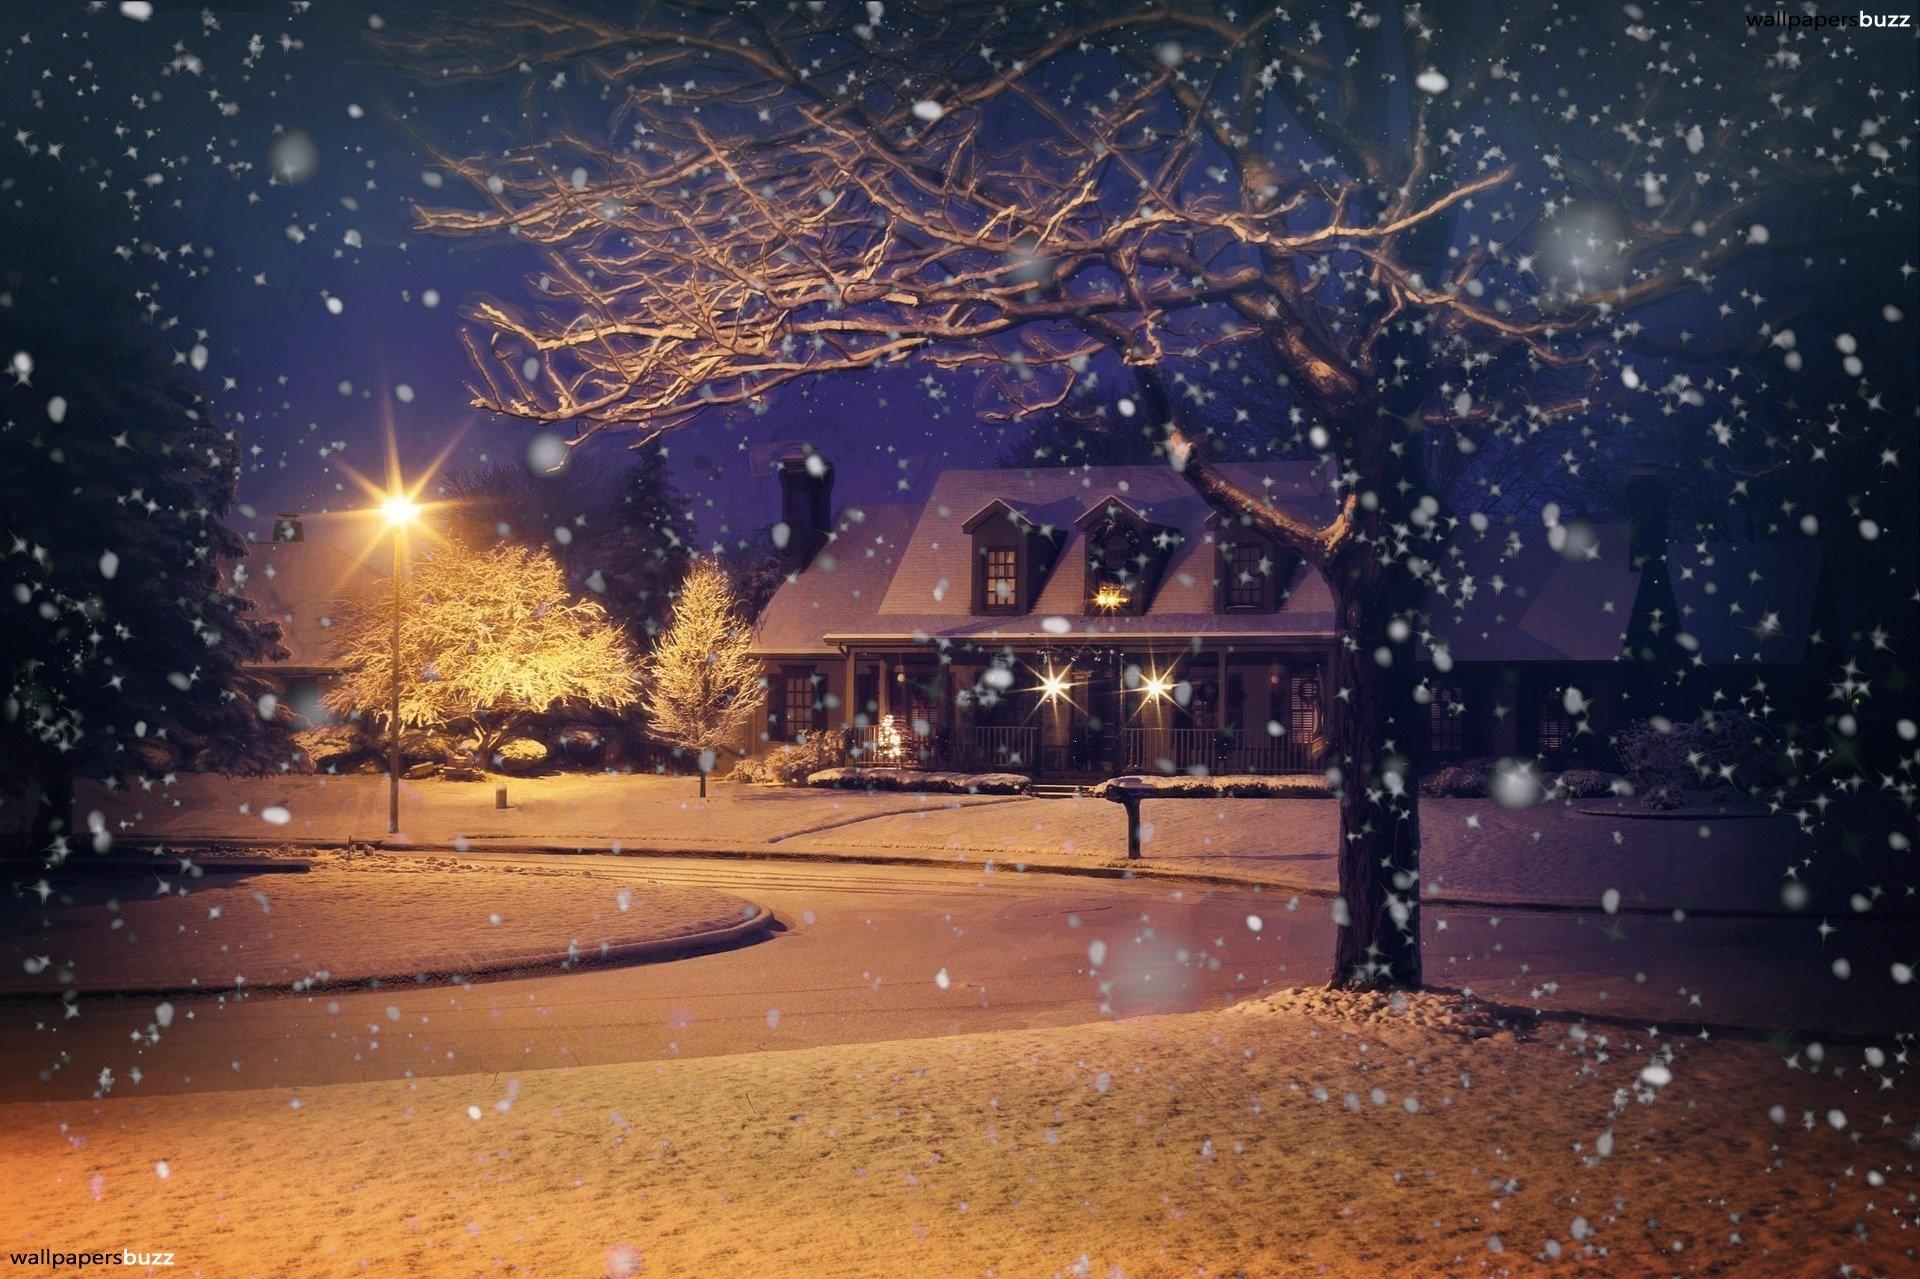 Cozy Winter Wallpaper 64 Images